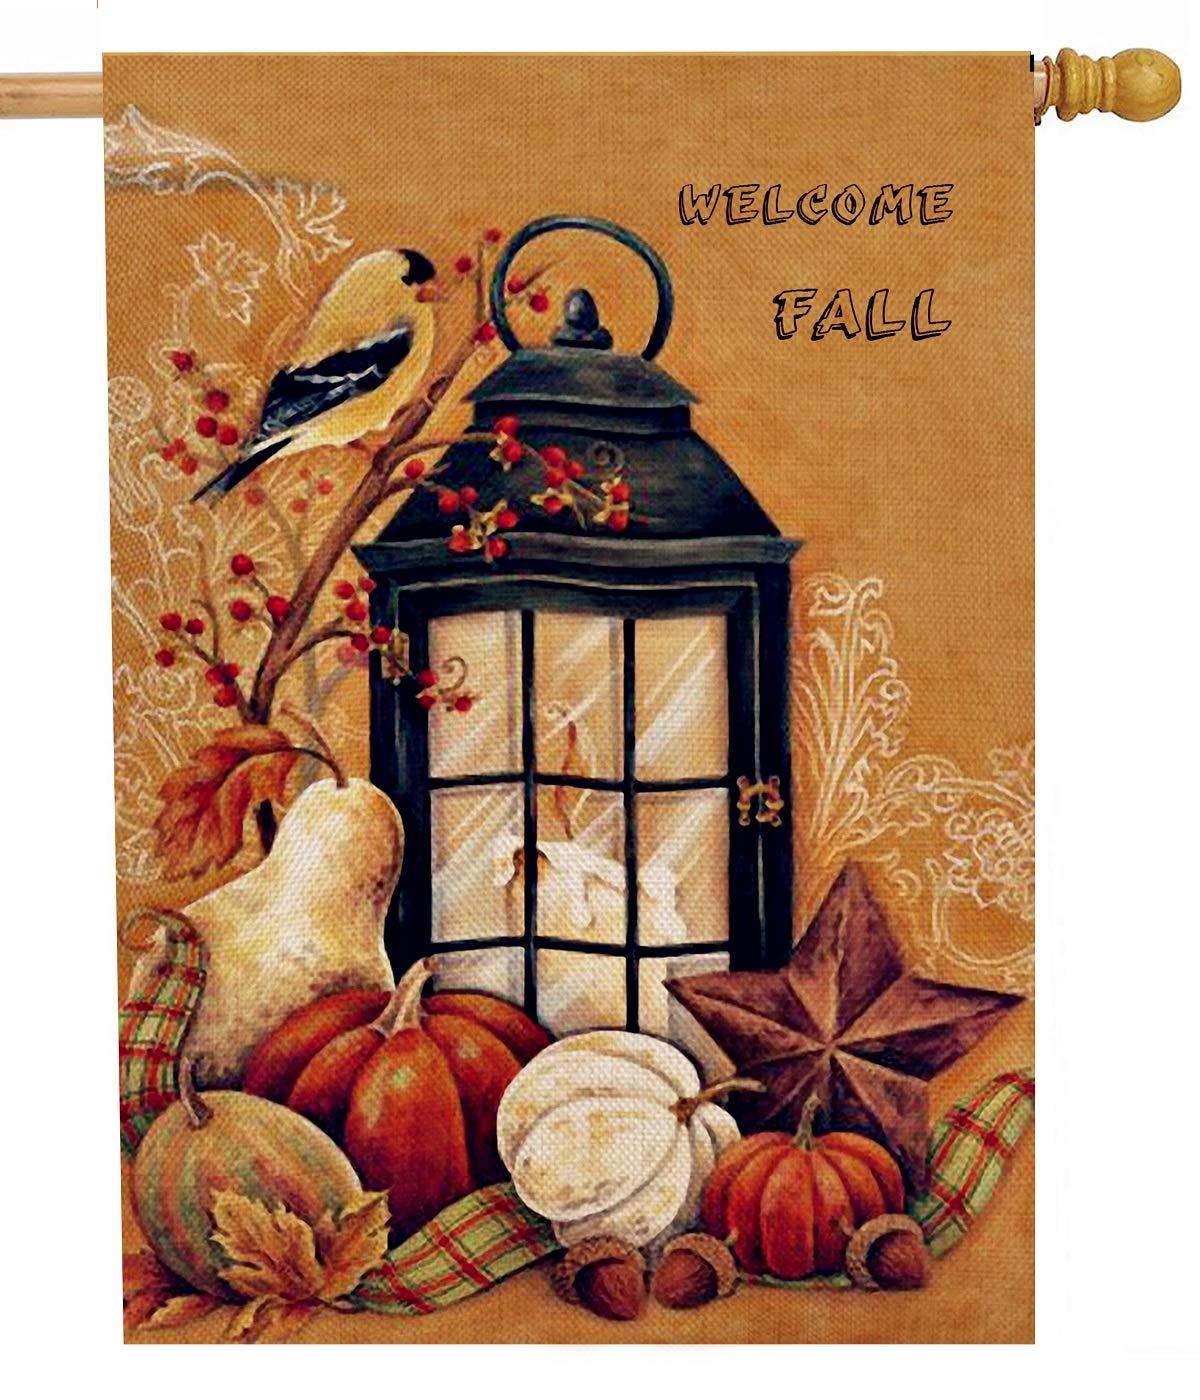 Dyrenson Welcome Fall Orioles Bird 28 x 40 House Flag Quote Double Sided, Autumn Harvest Pumpkin Primitive Garden Yard Decoration, Seasonal Outdoor Décor Decorative Large Flag Vintage Candle Light